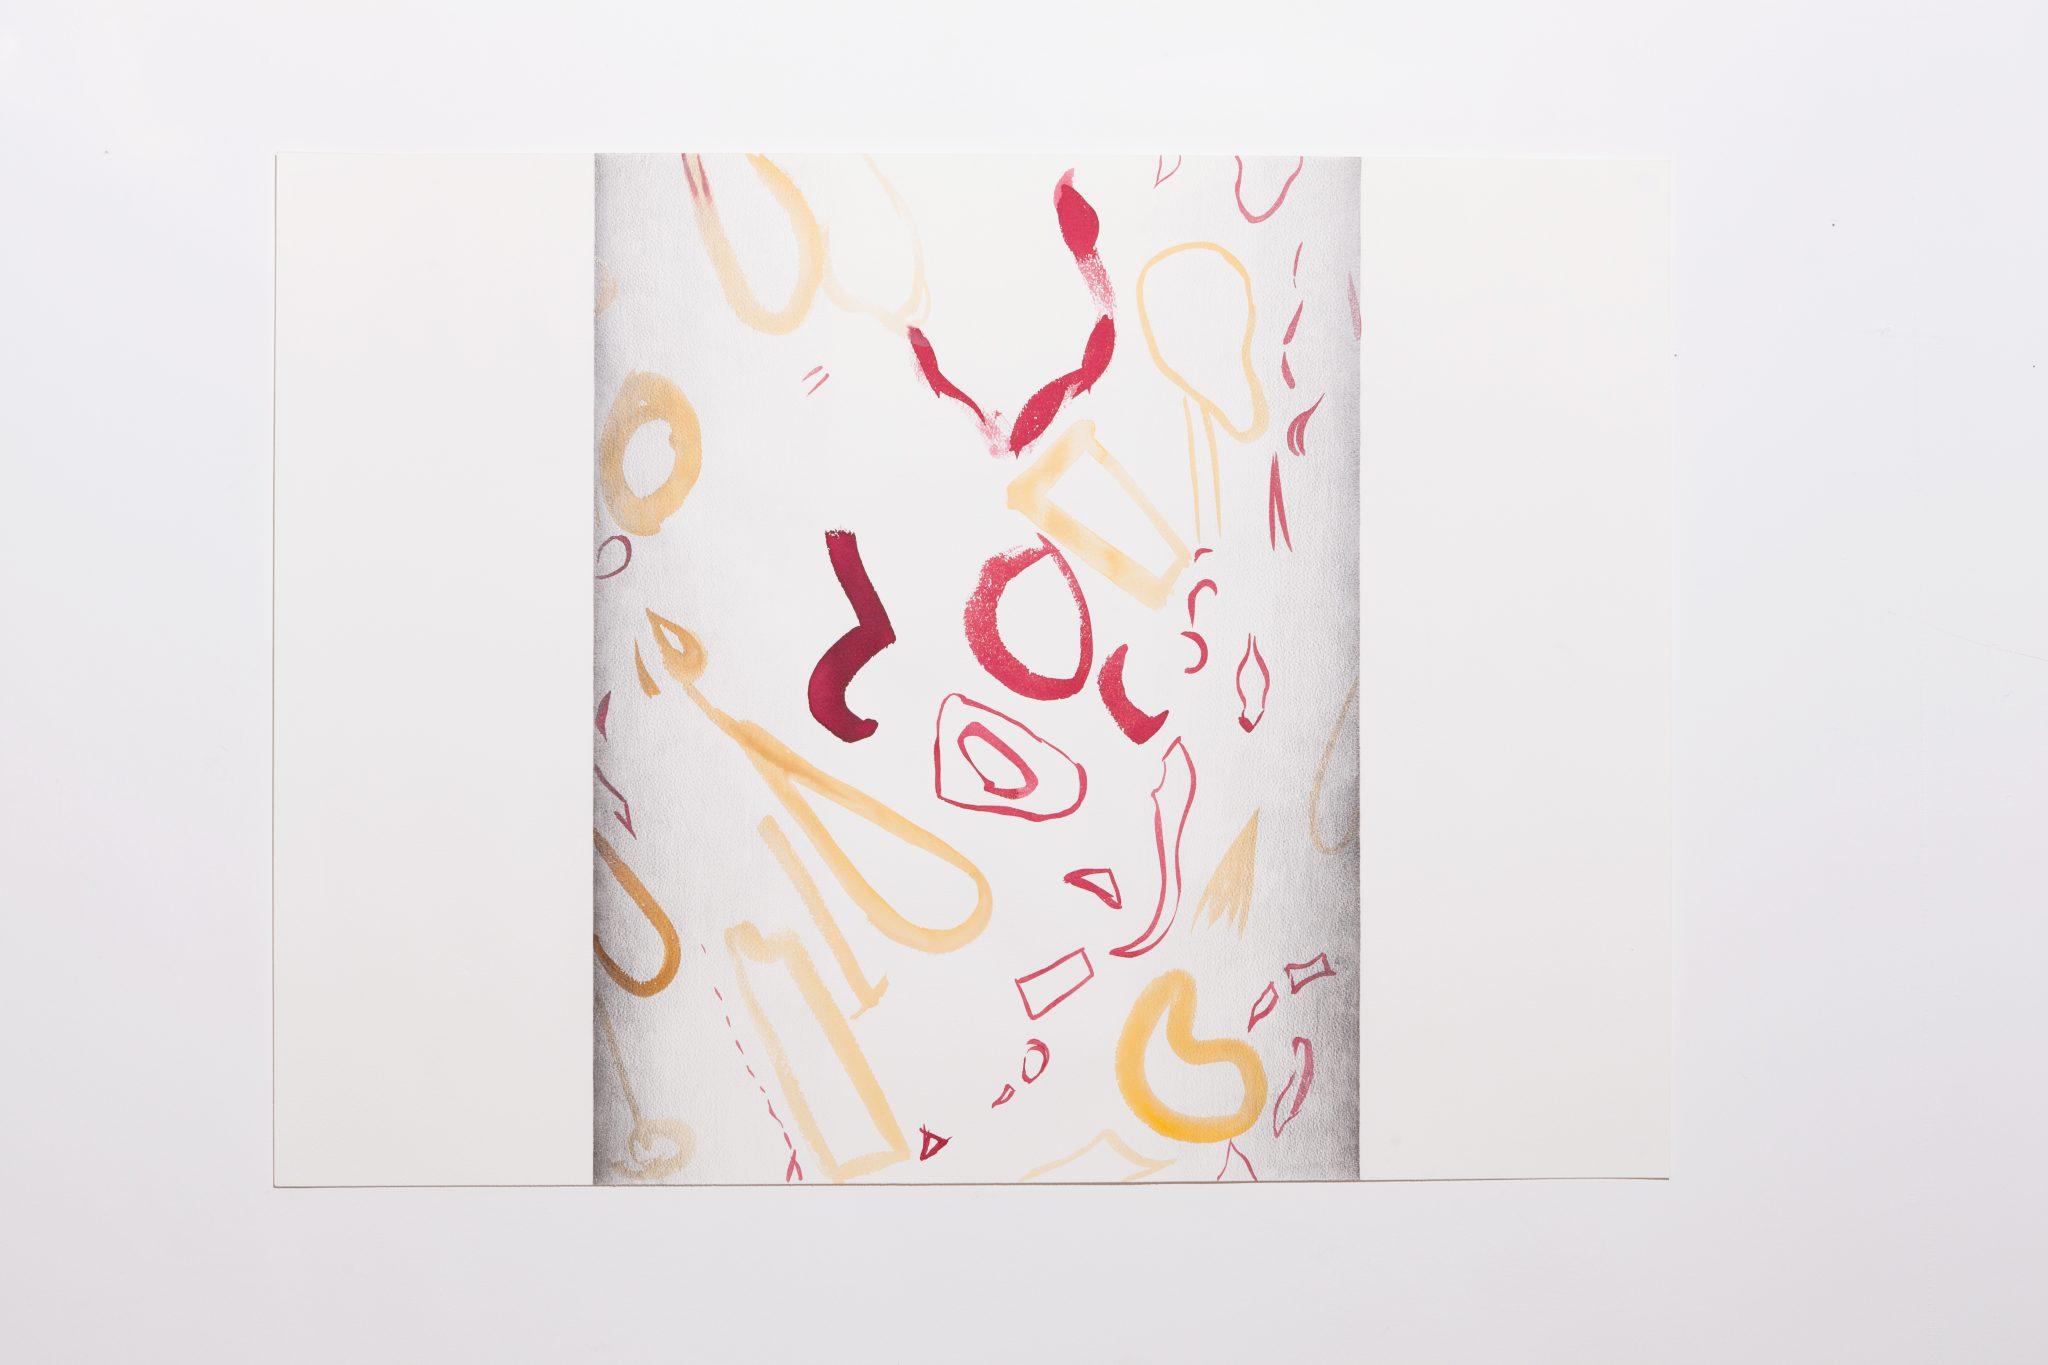 Pillar - Pencil, gouache, ink on paper